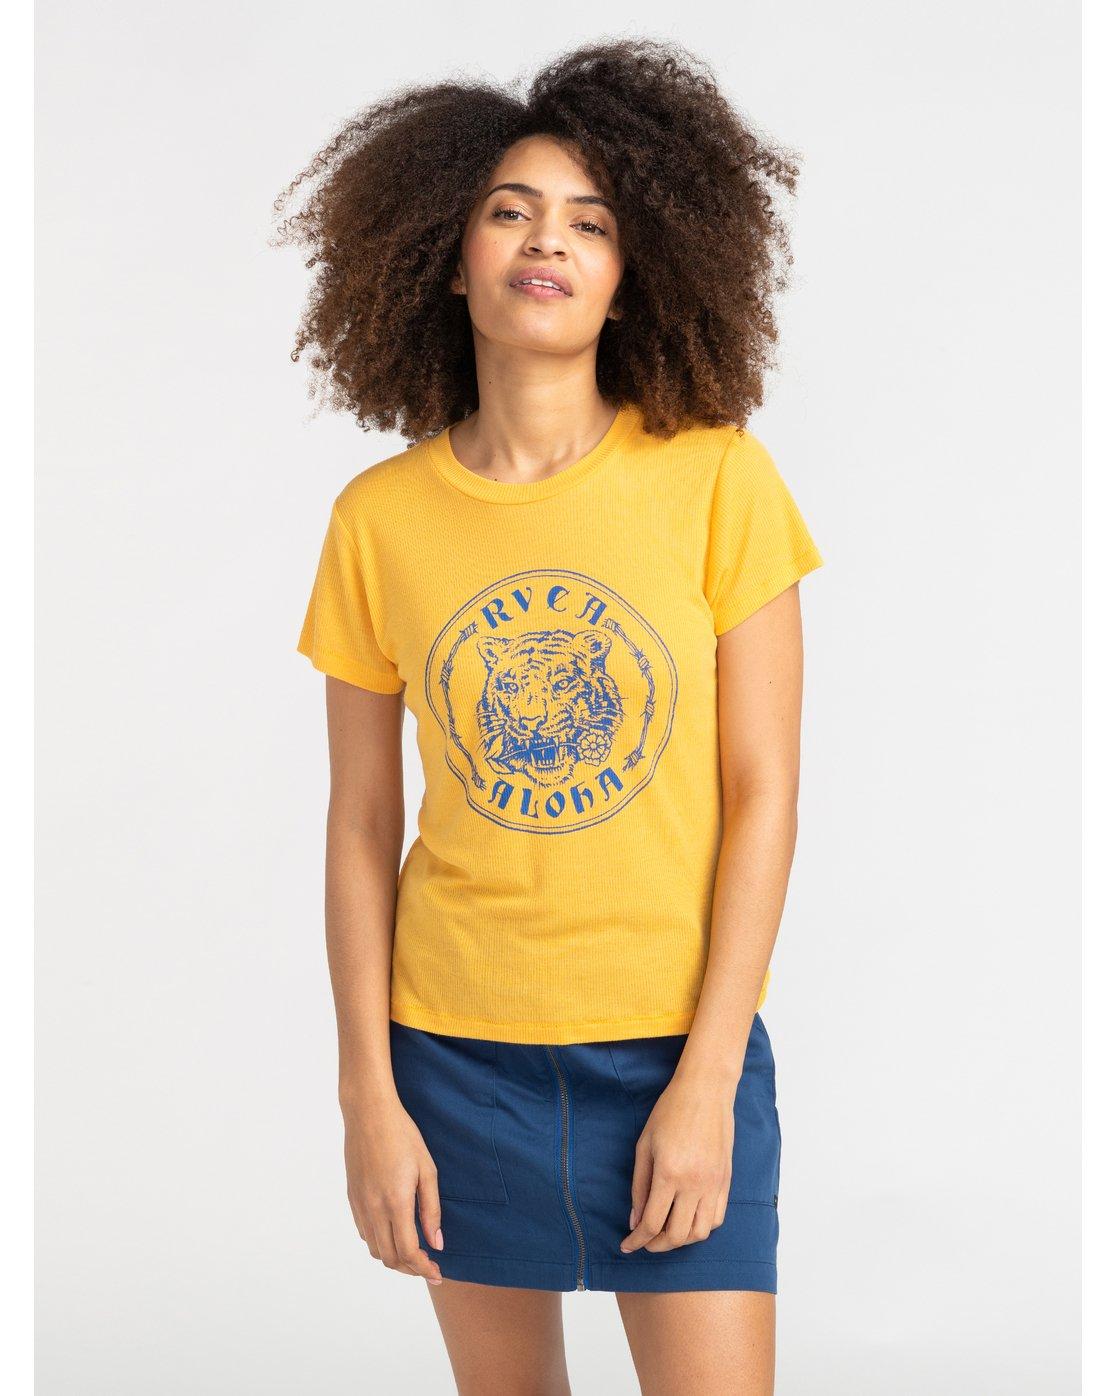 1 Benjamin Jeanjean Alohatiger - T-Shirt for T-Shirt Yellow S3SSRIRVP0 RVCA